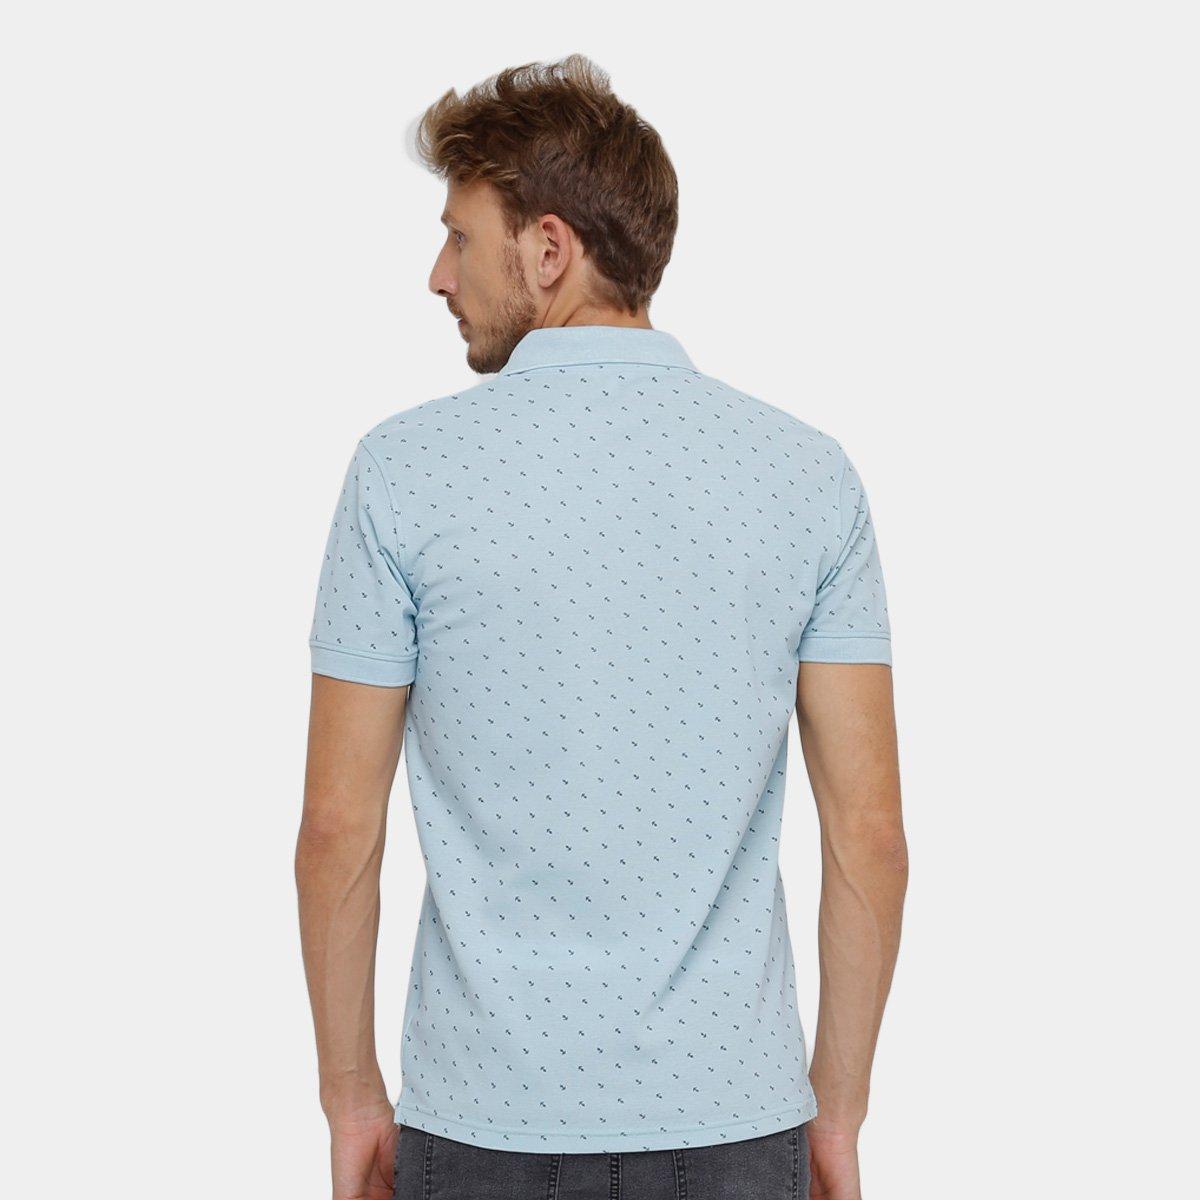 Camisa Polo Blue Bay Piquet Mini Print Âncora Masculina - Compre ... efbb5cdbf0c